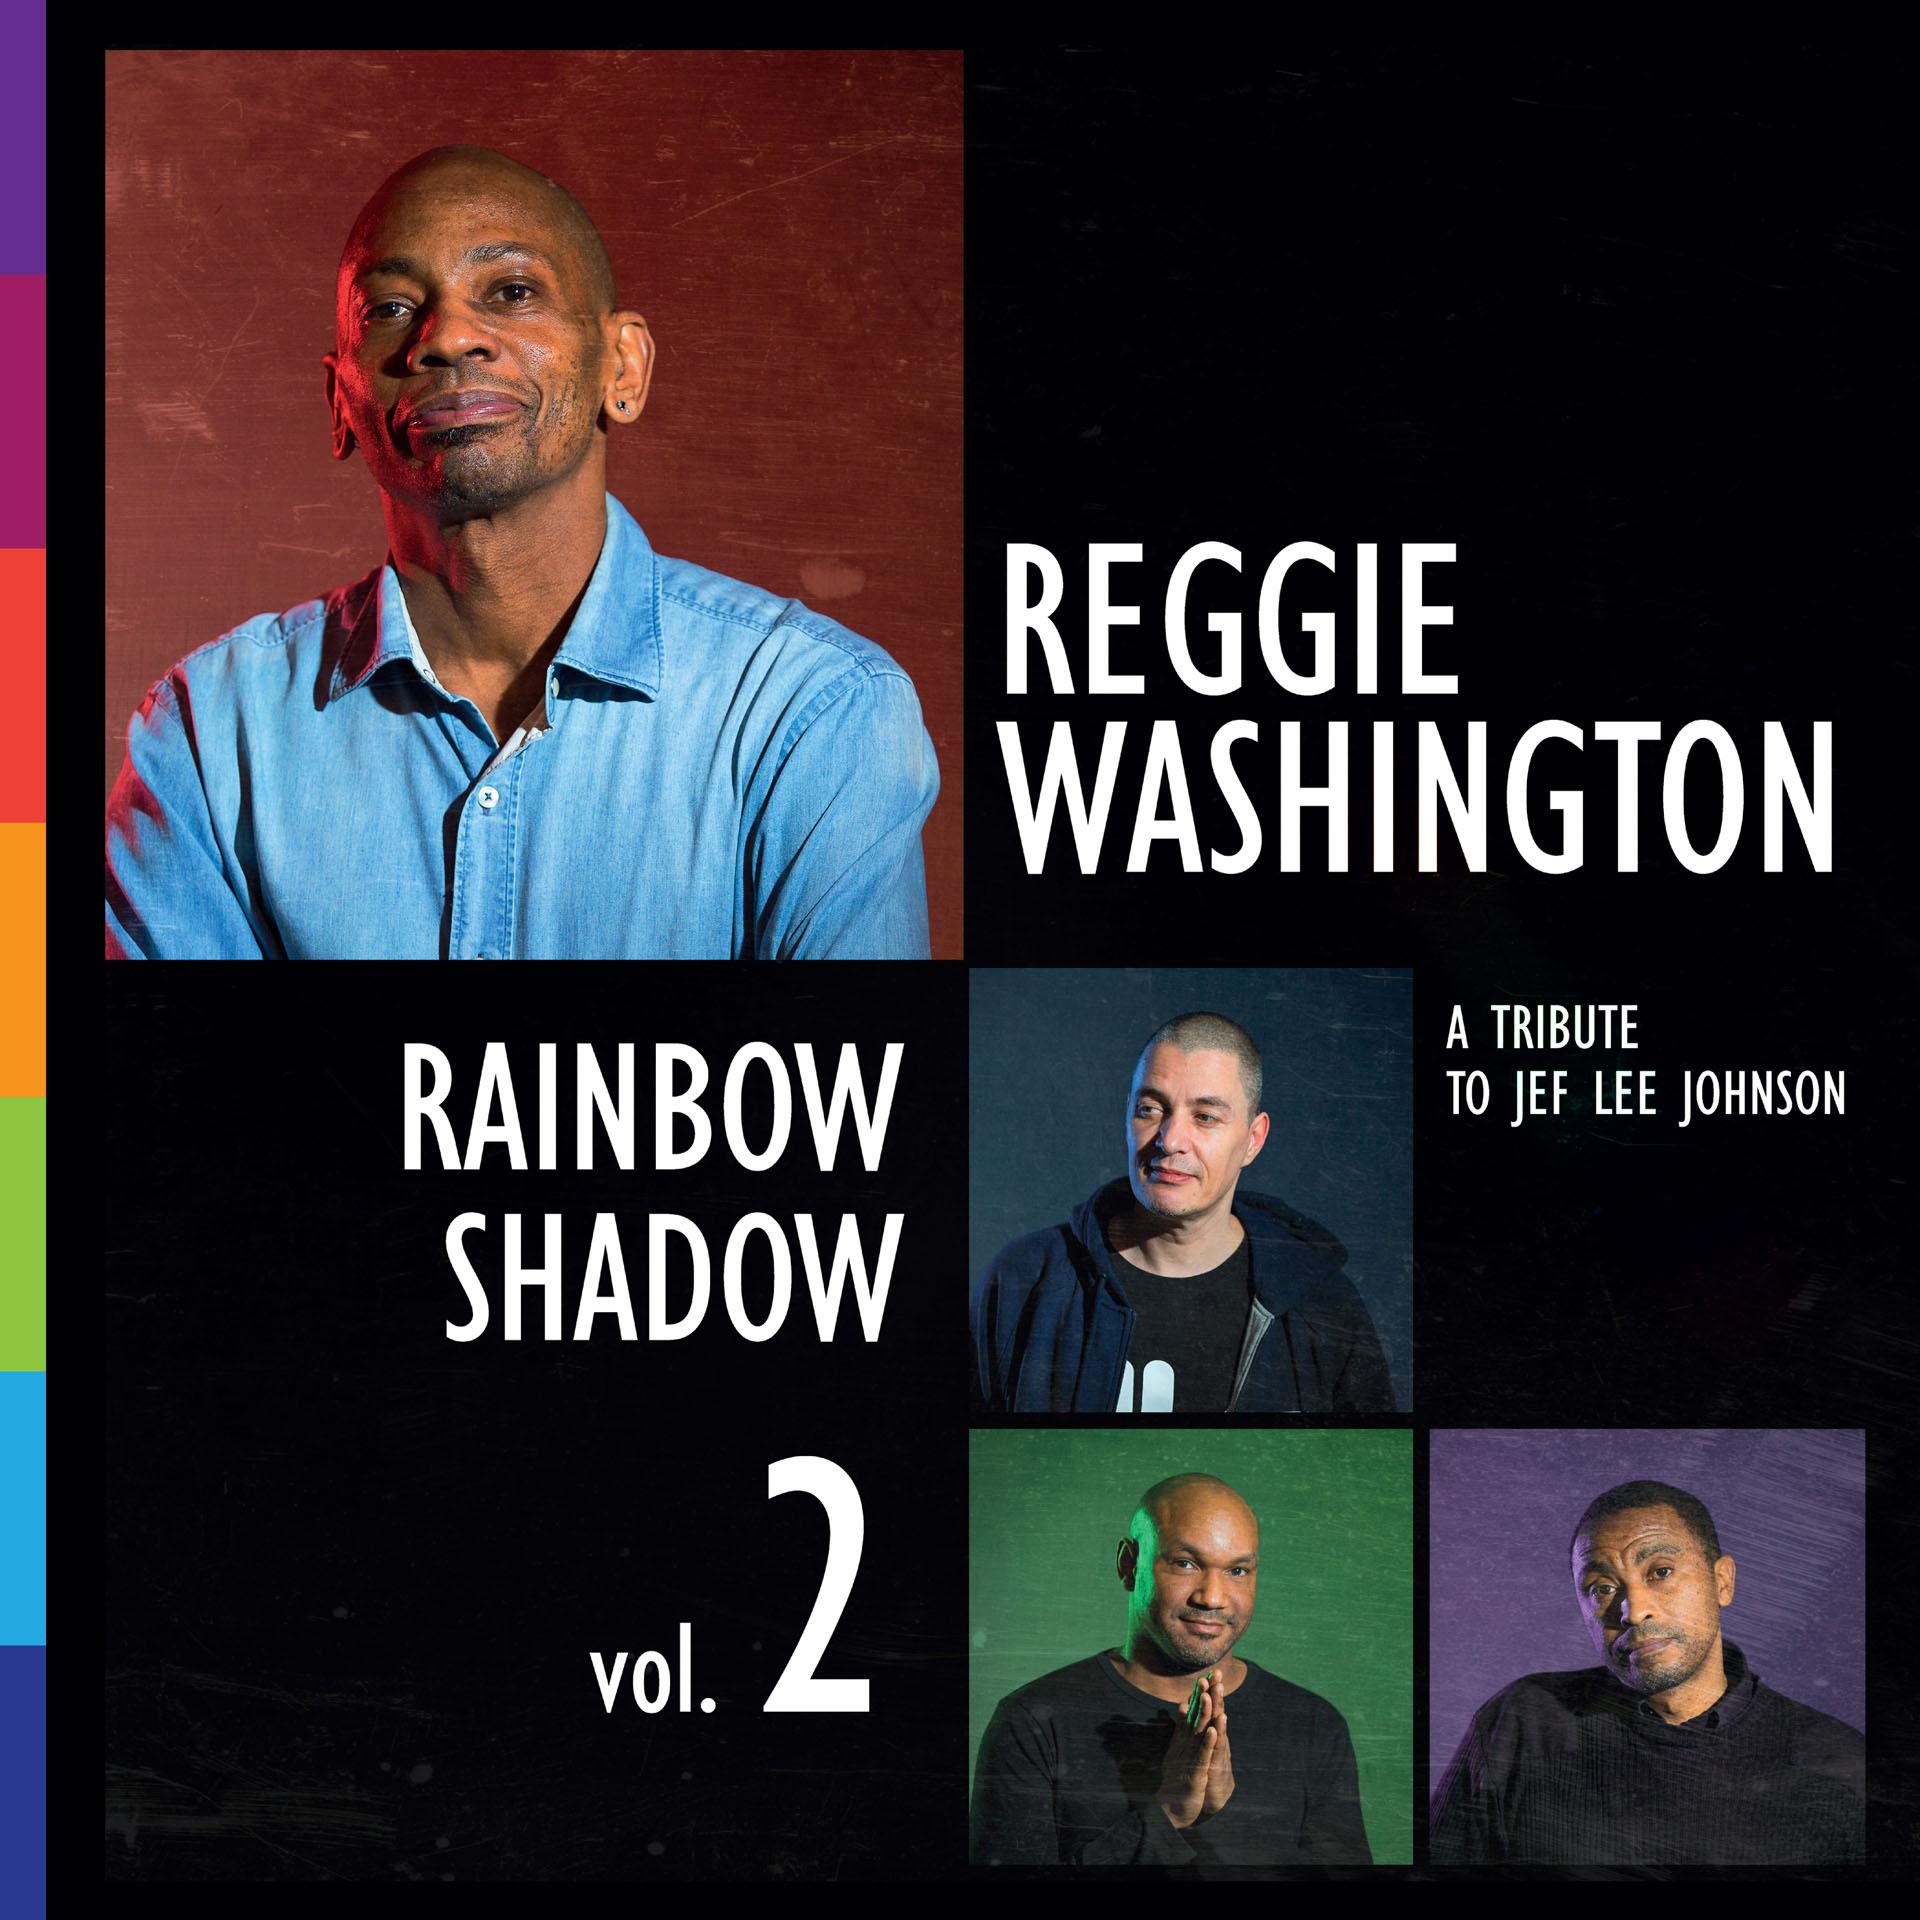 Reggie Washington - Rainbow Shadow Vol. 2 (CD)